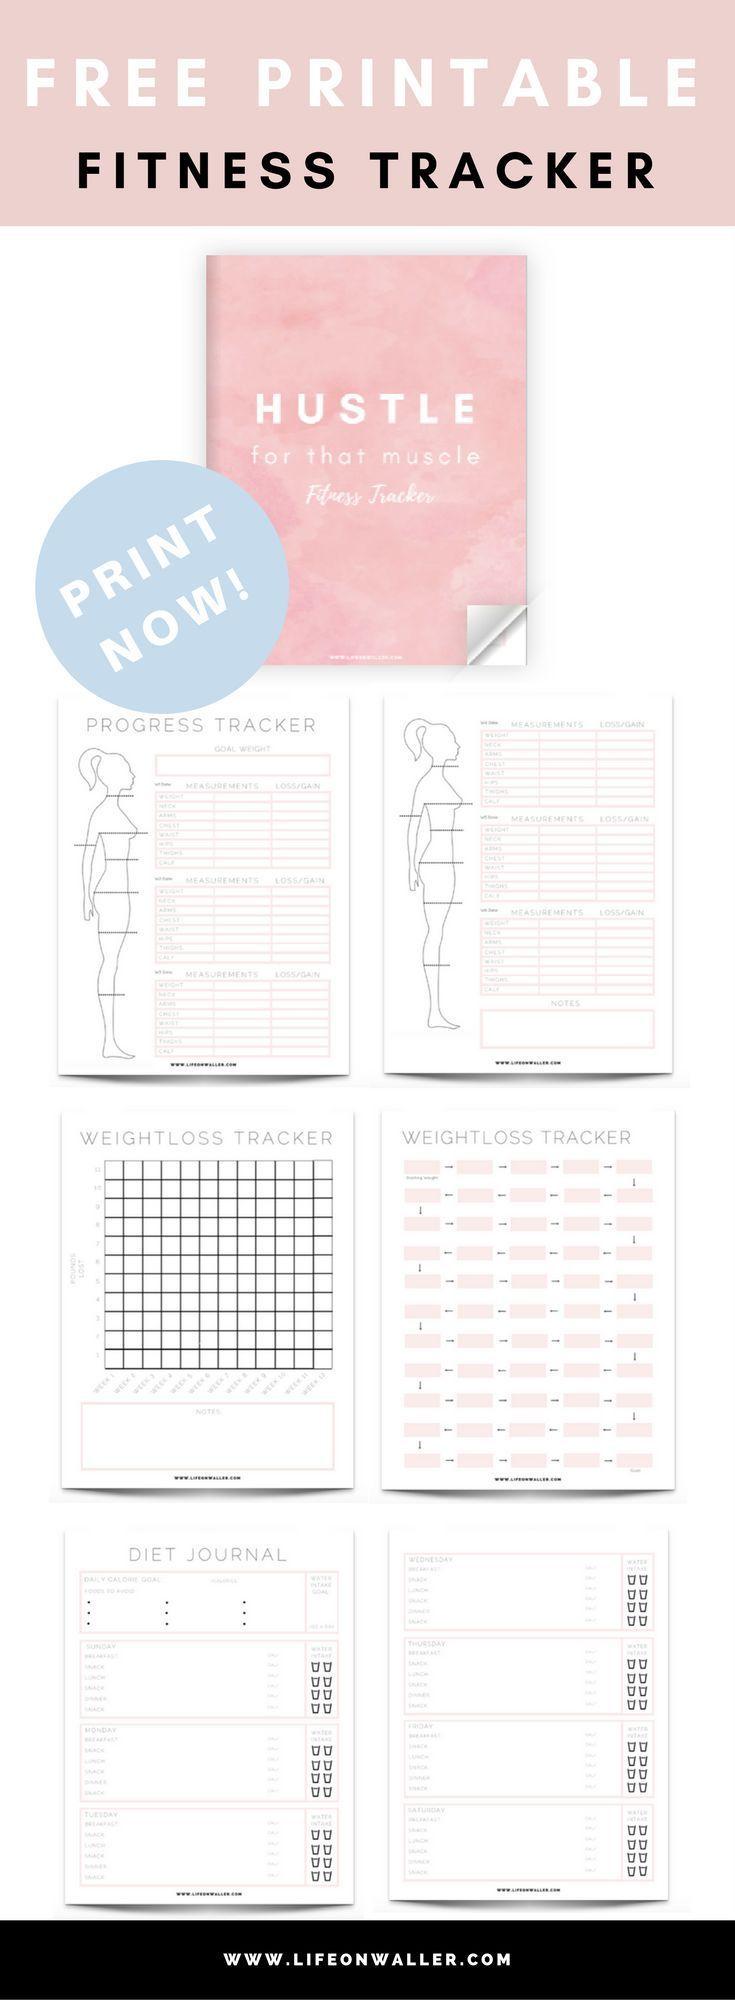 Free Printable Fitness Tracker - #Fitness #FREE #Printable #Tracker